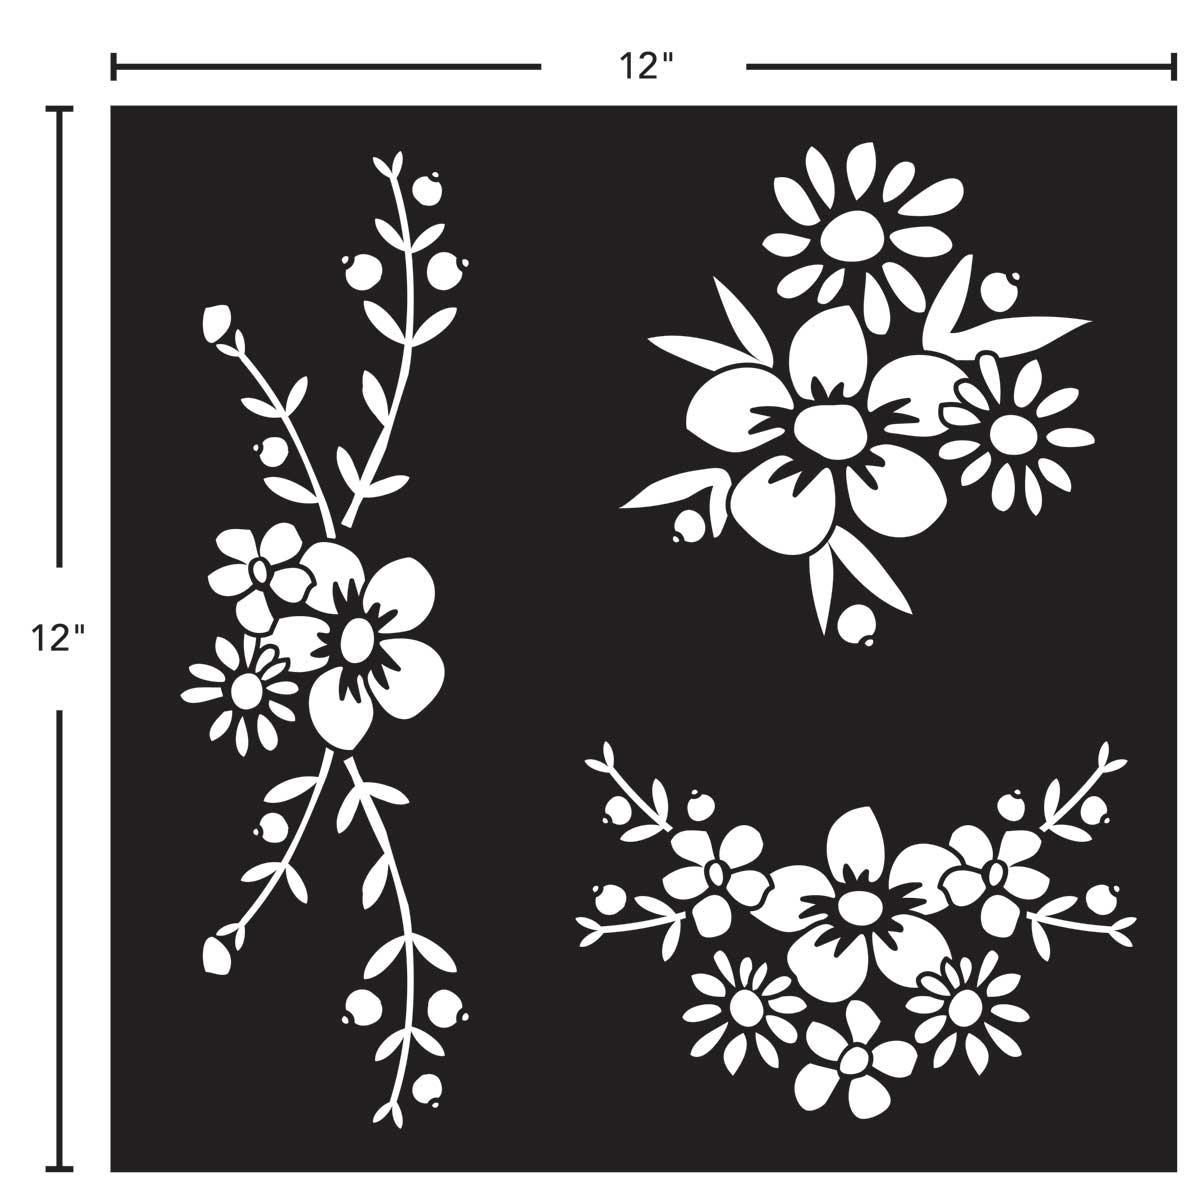 FolkArt ® Painting Stencils - Adhesive Laser - Floral Spray